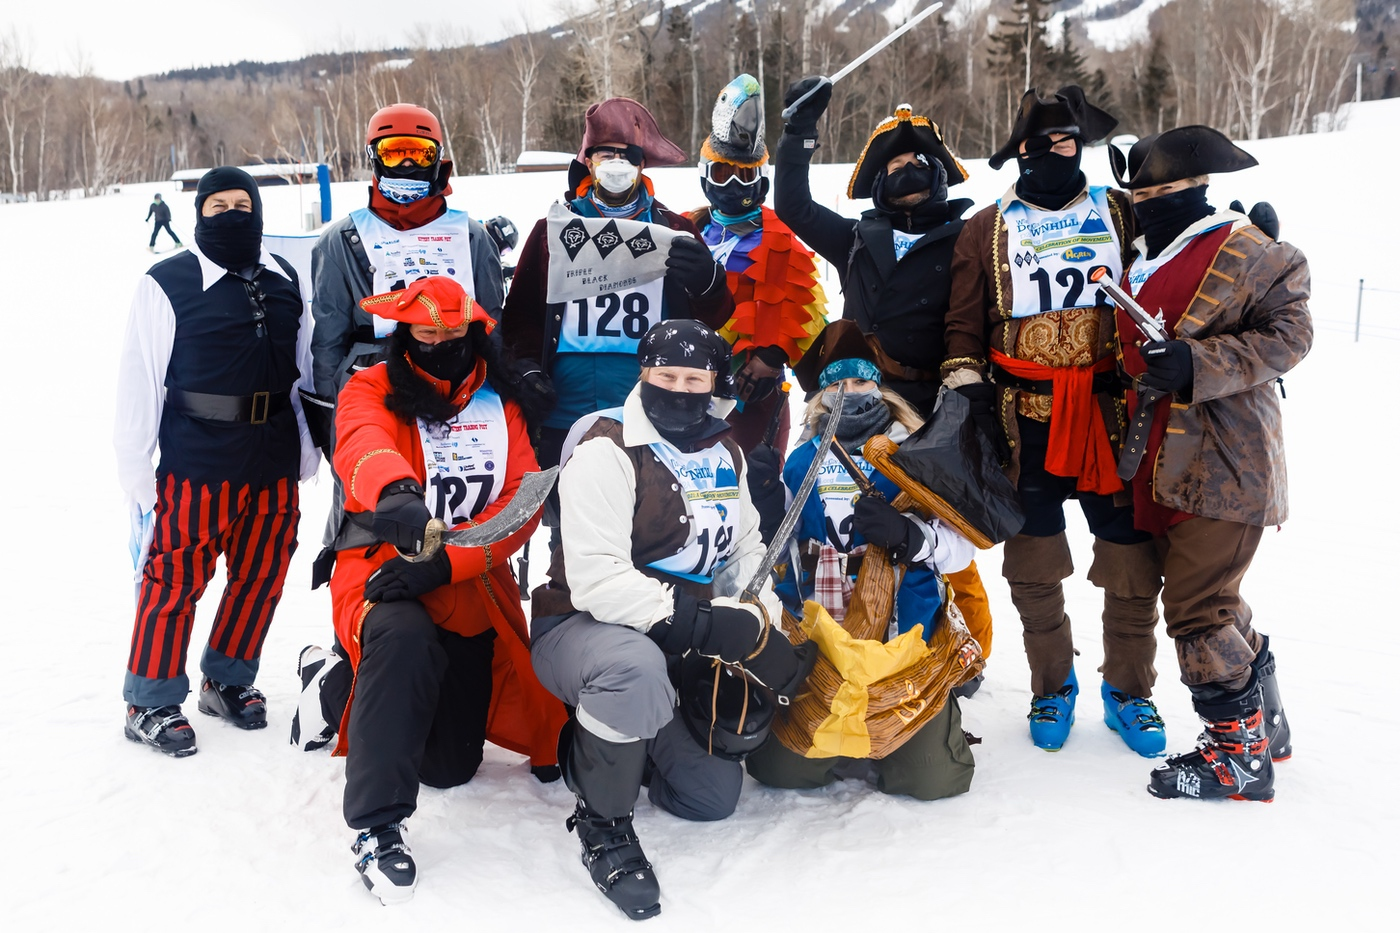 WinterKids Downhill 24 2021 SDP 2899